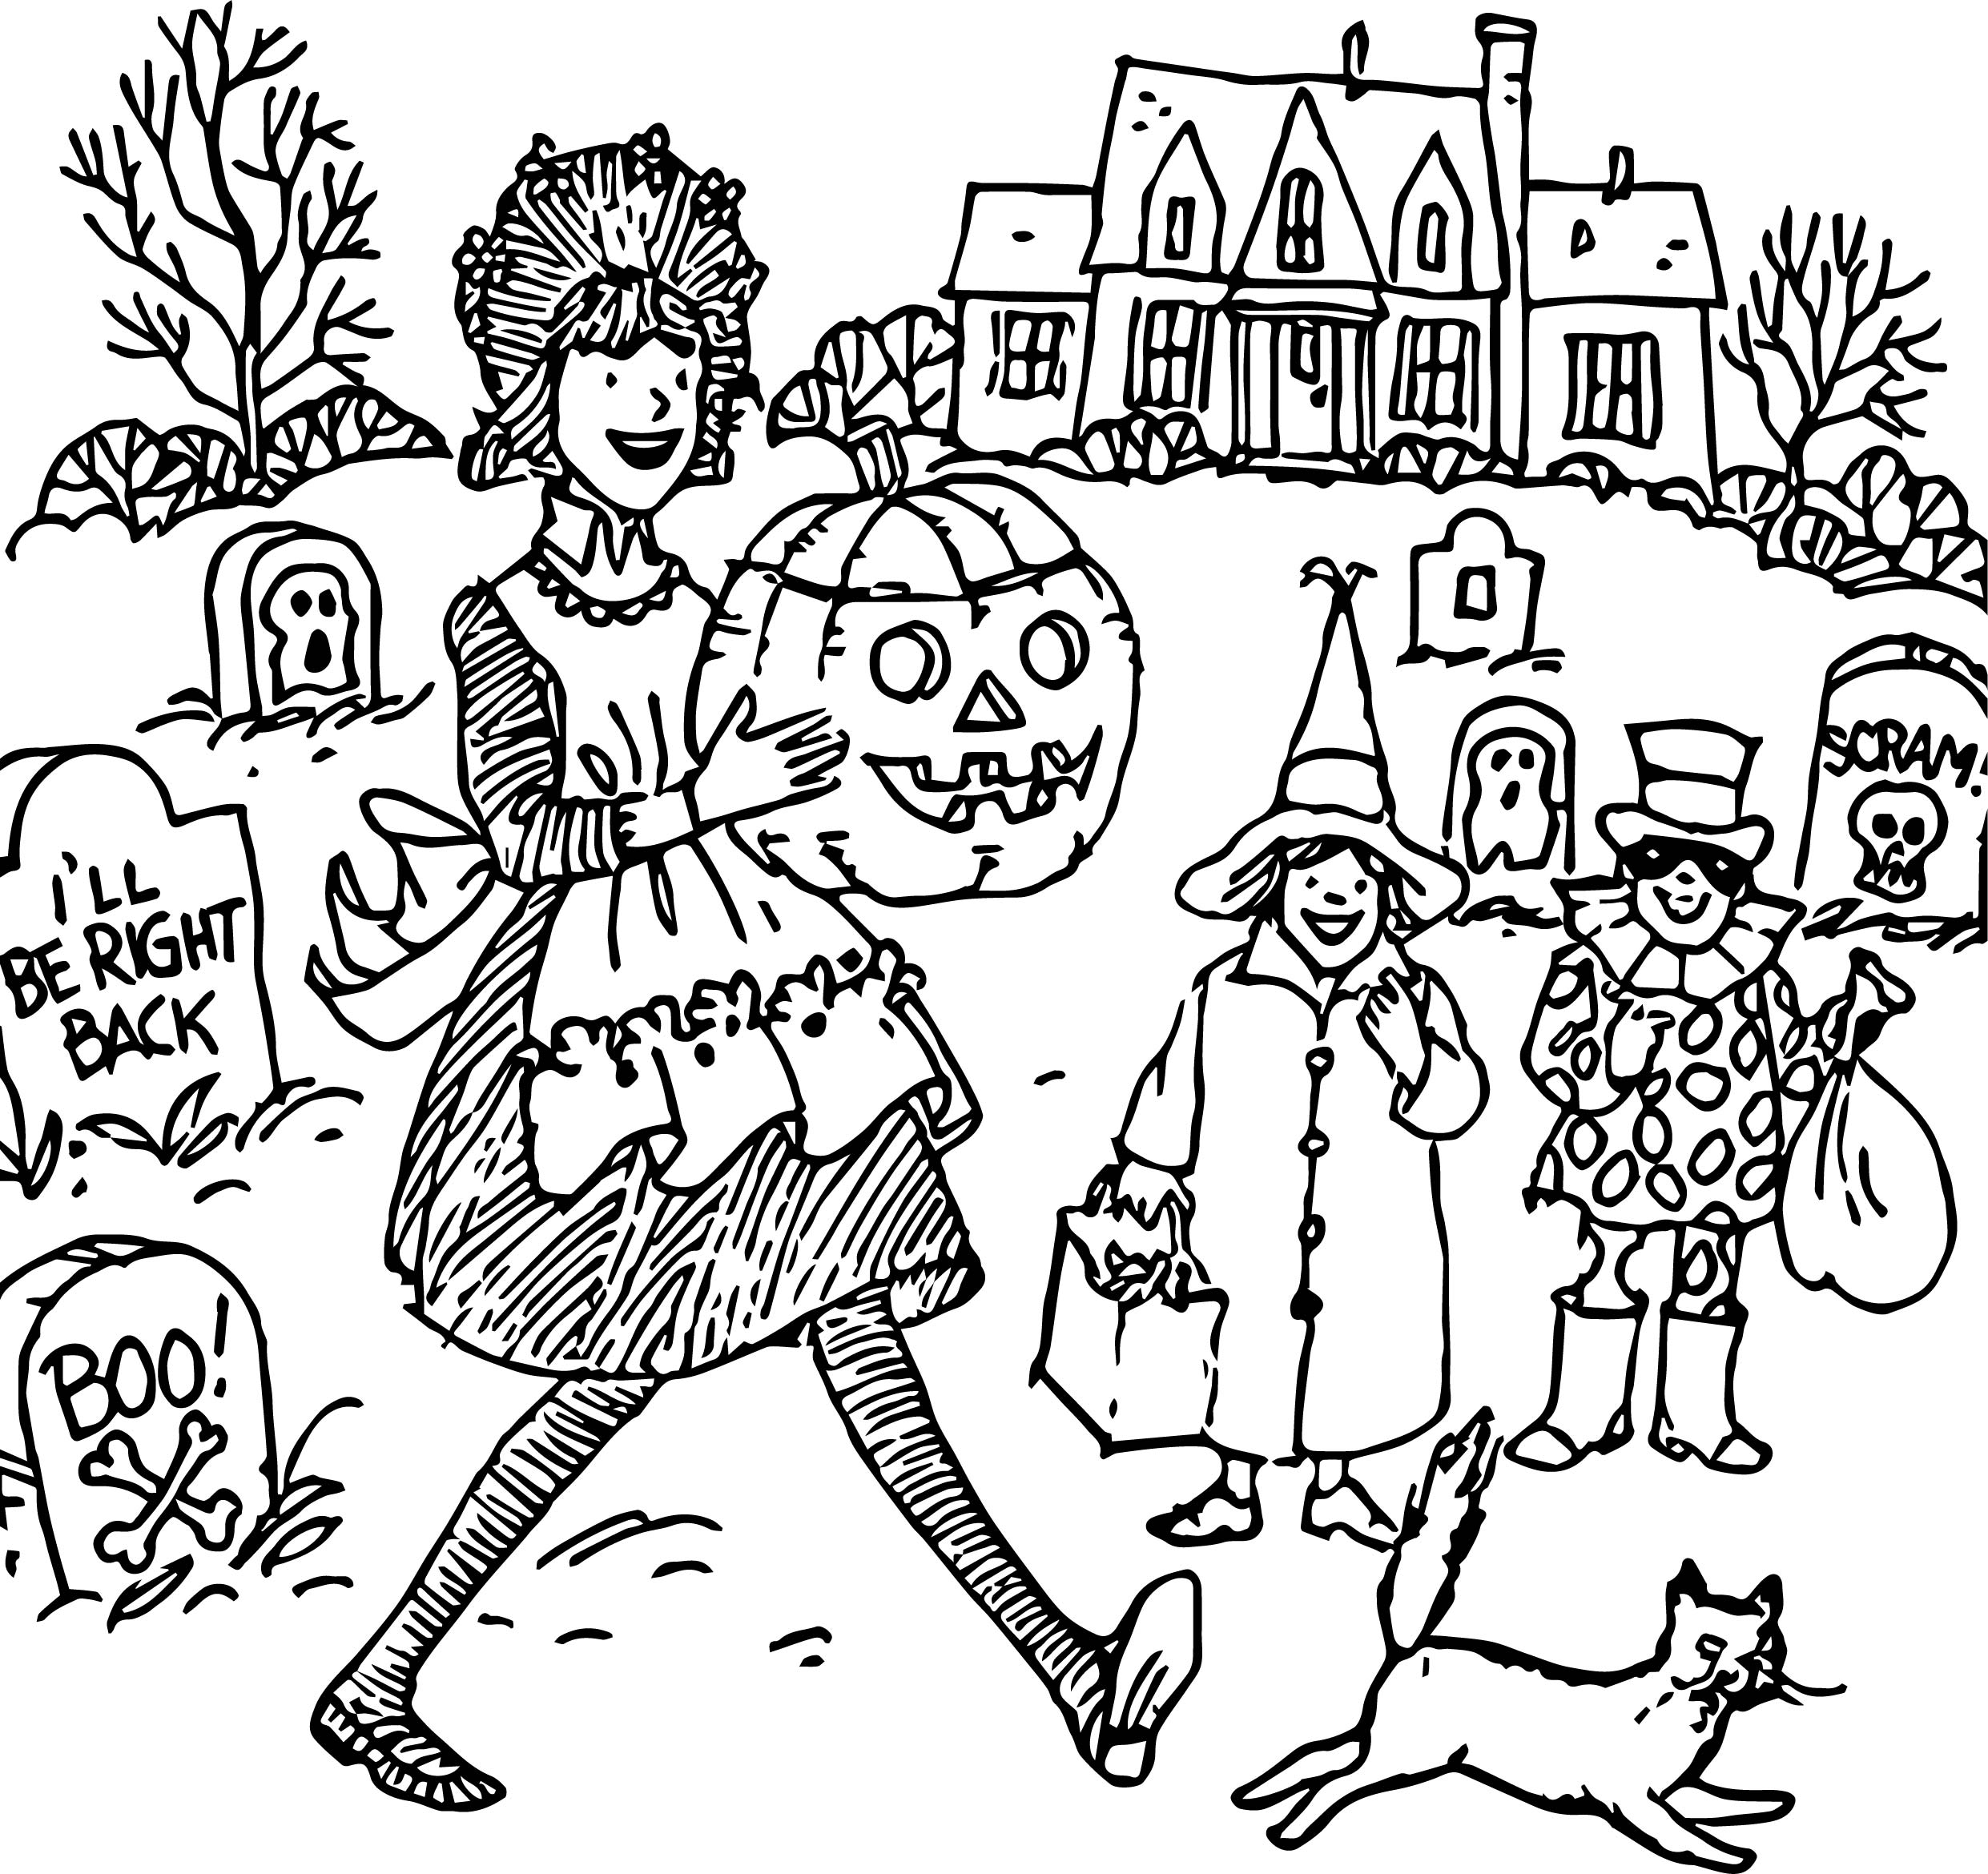 amelia bedelia coloring pages - happy haunting halloween amelia coloring page